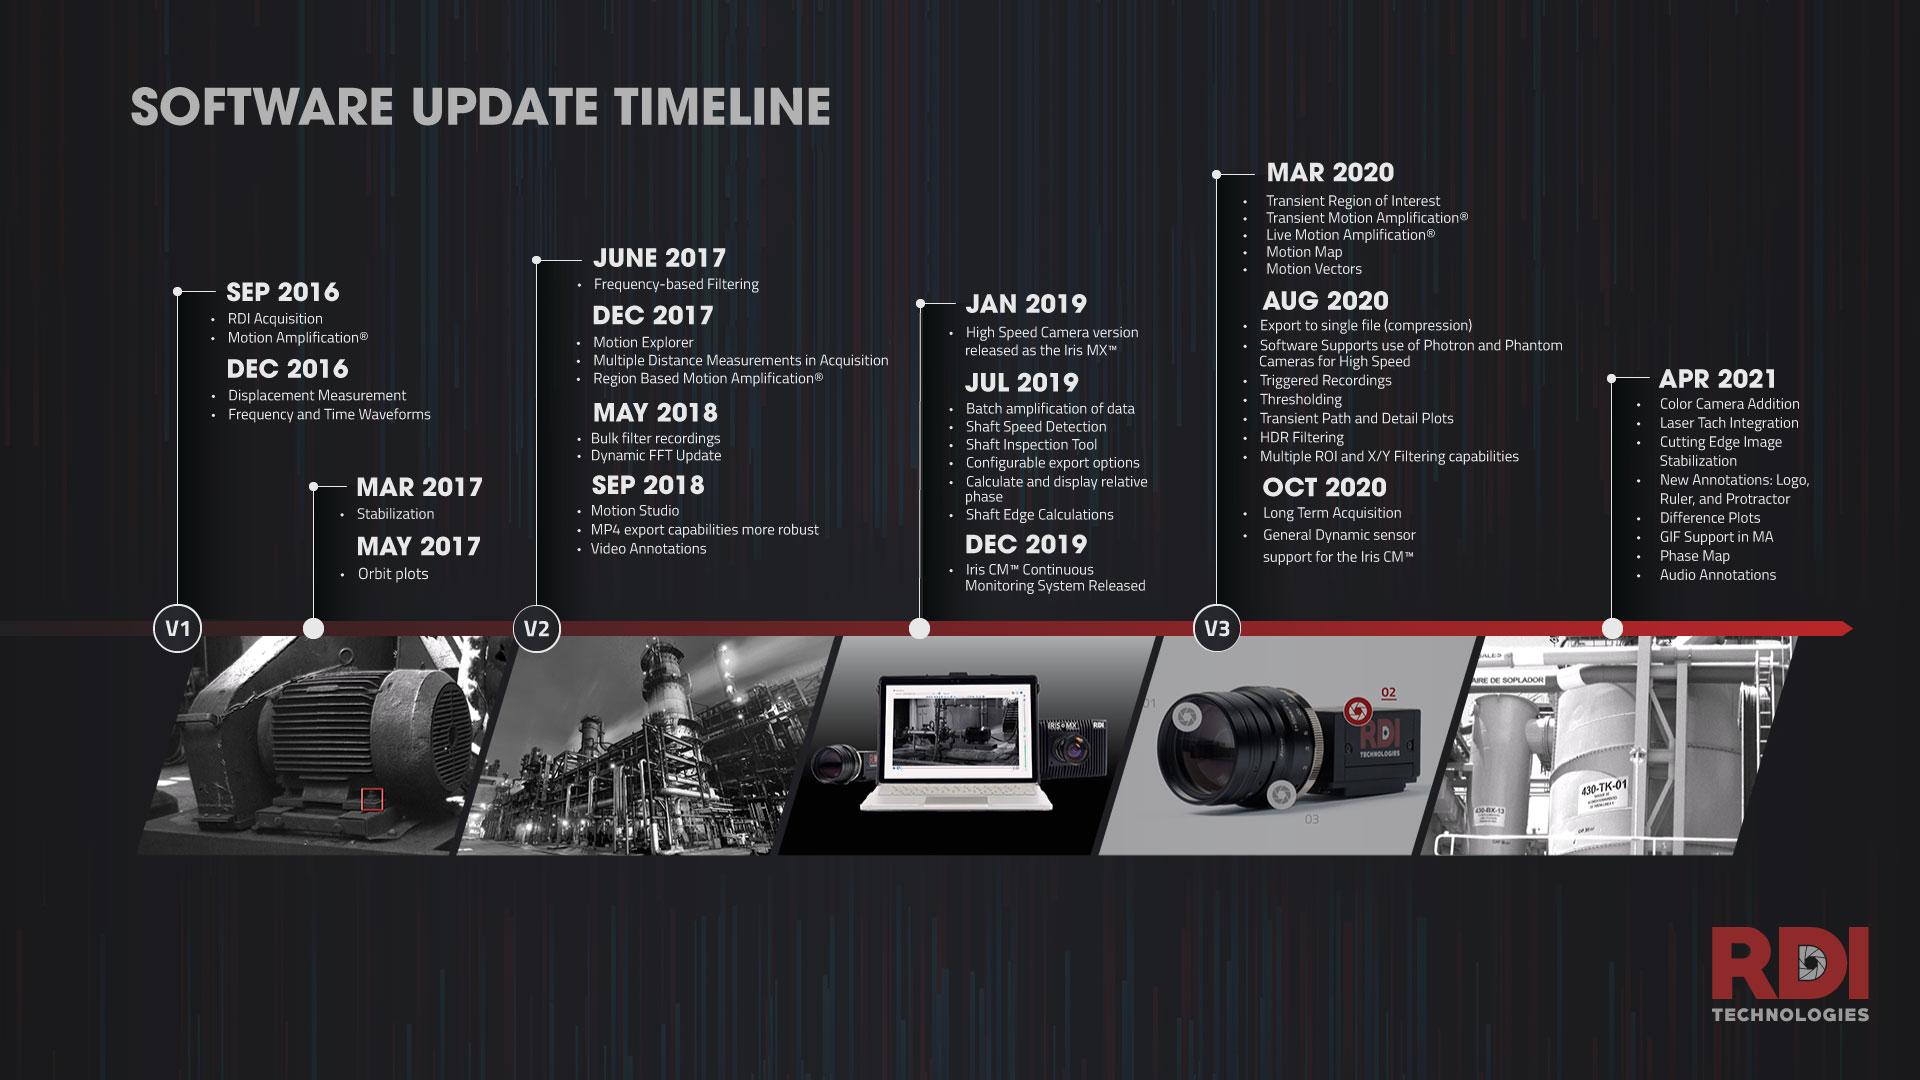 RDI Software Update Timeline